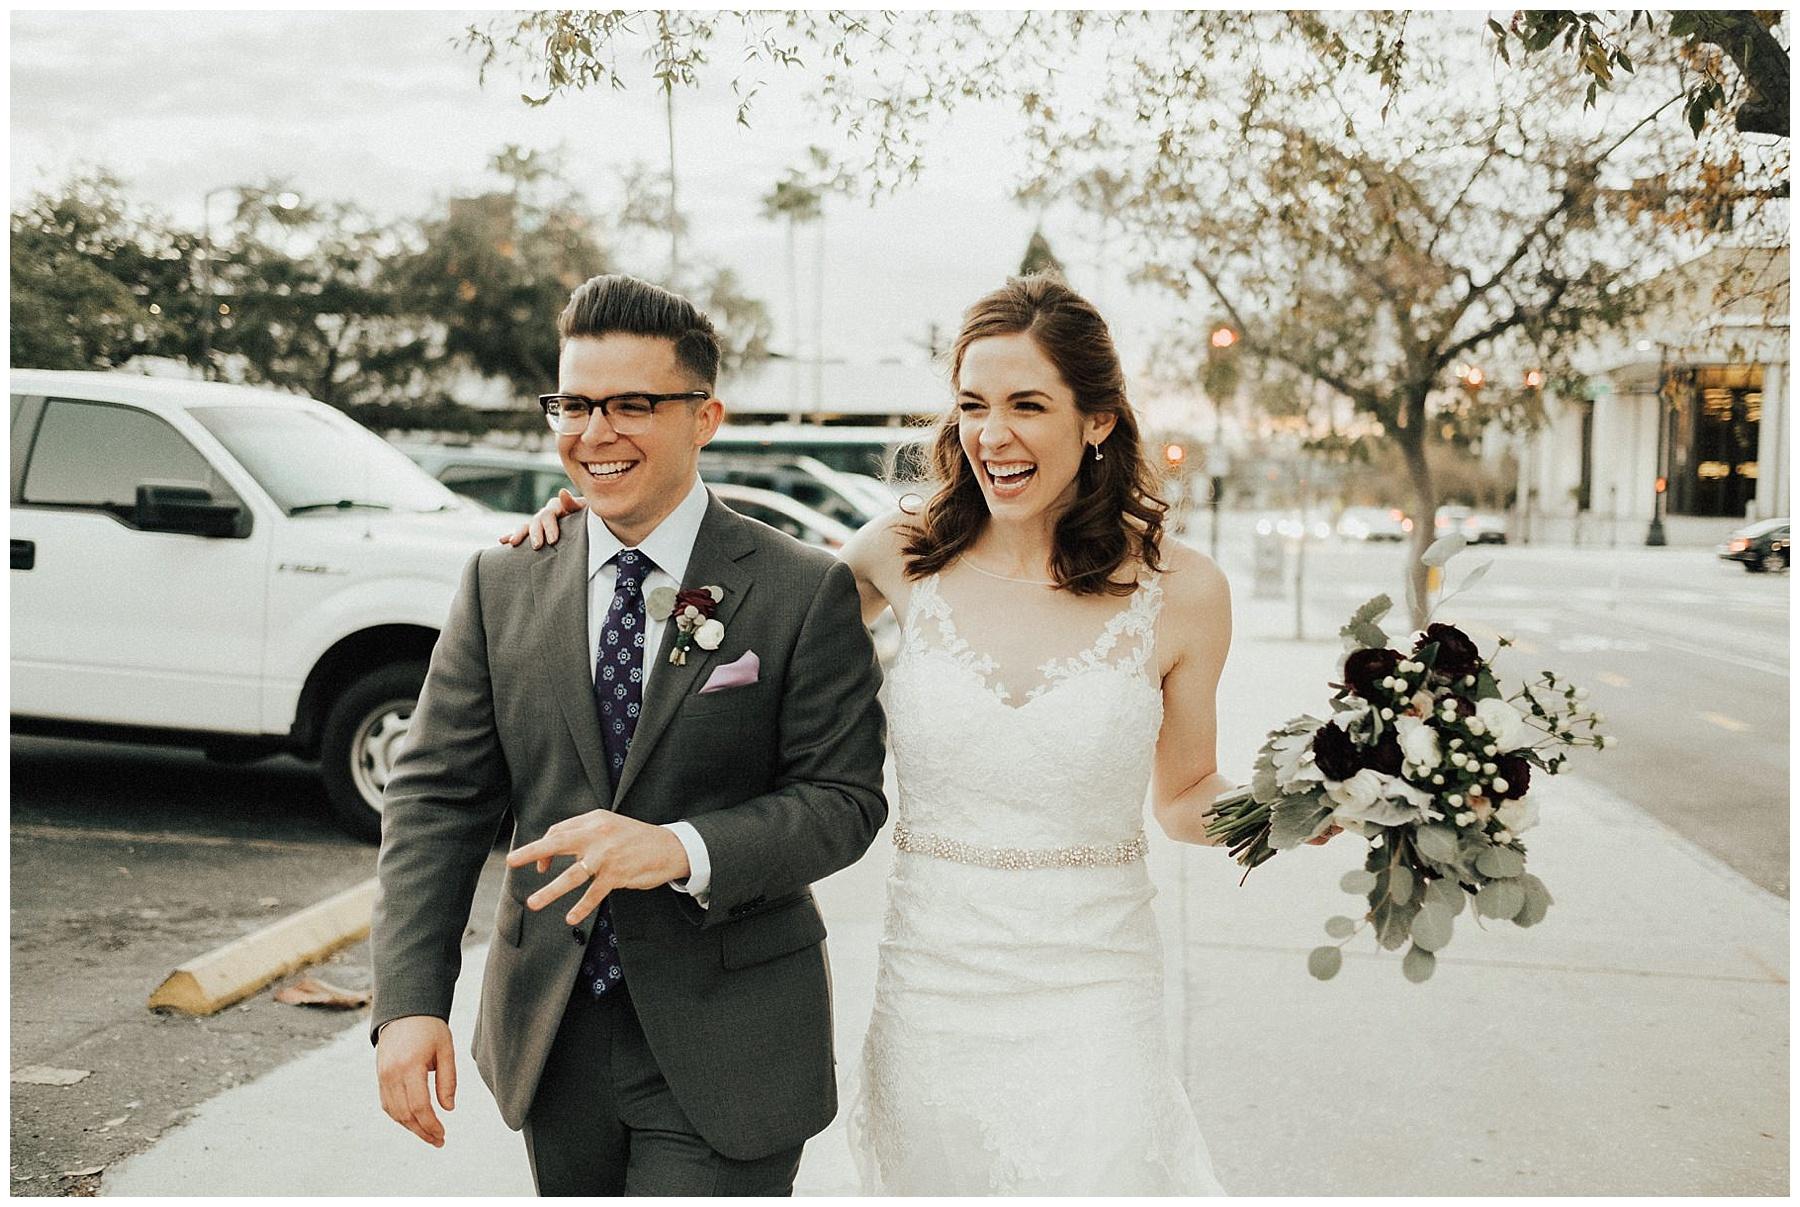 Kylie Garden Wedding Tampa Wedding Photographer-110.jpg